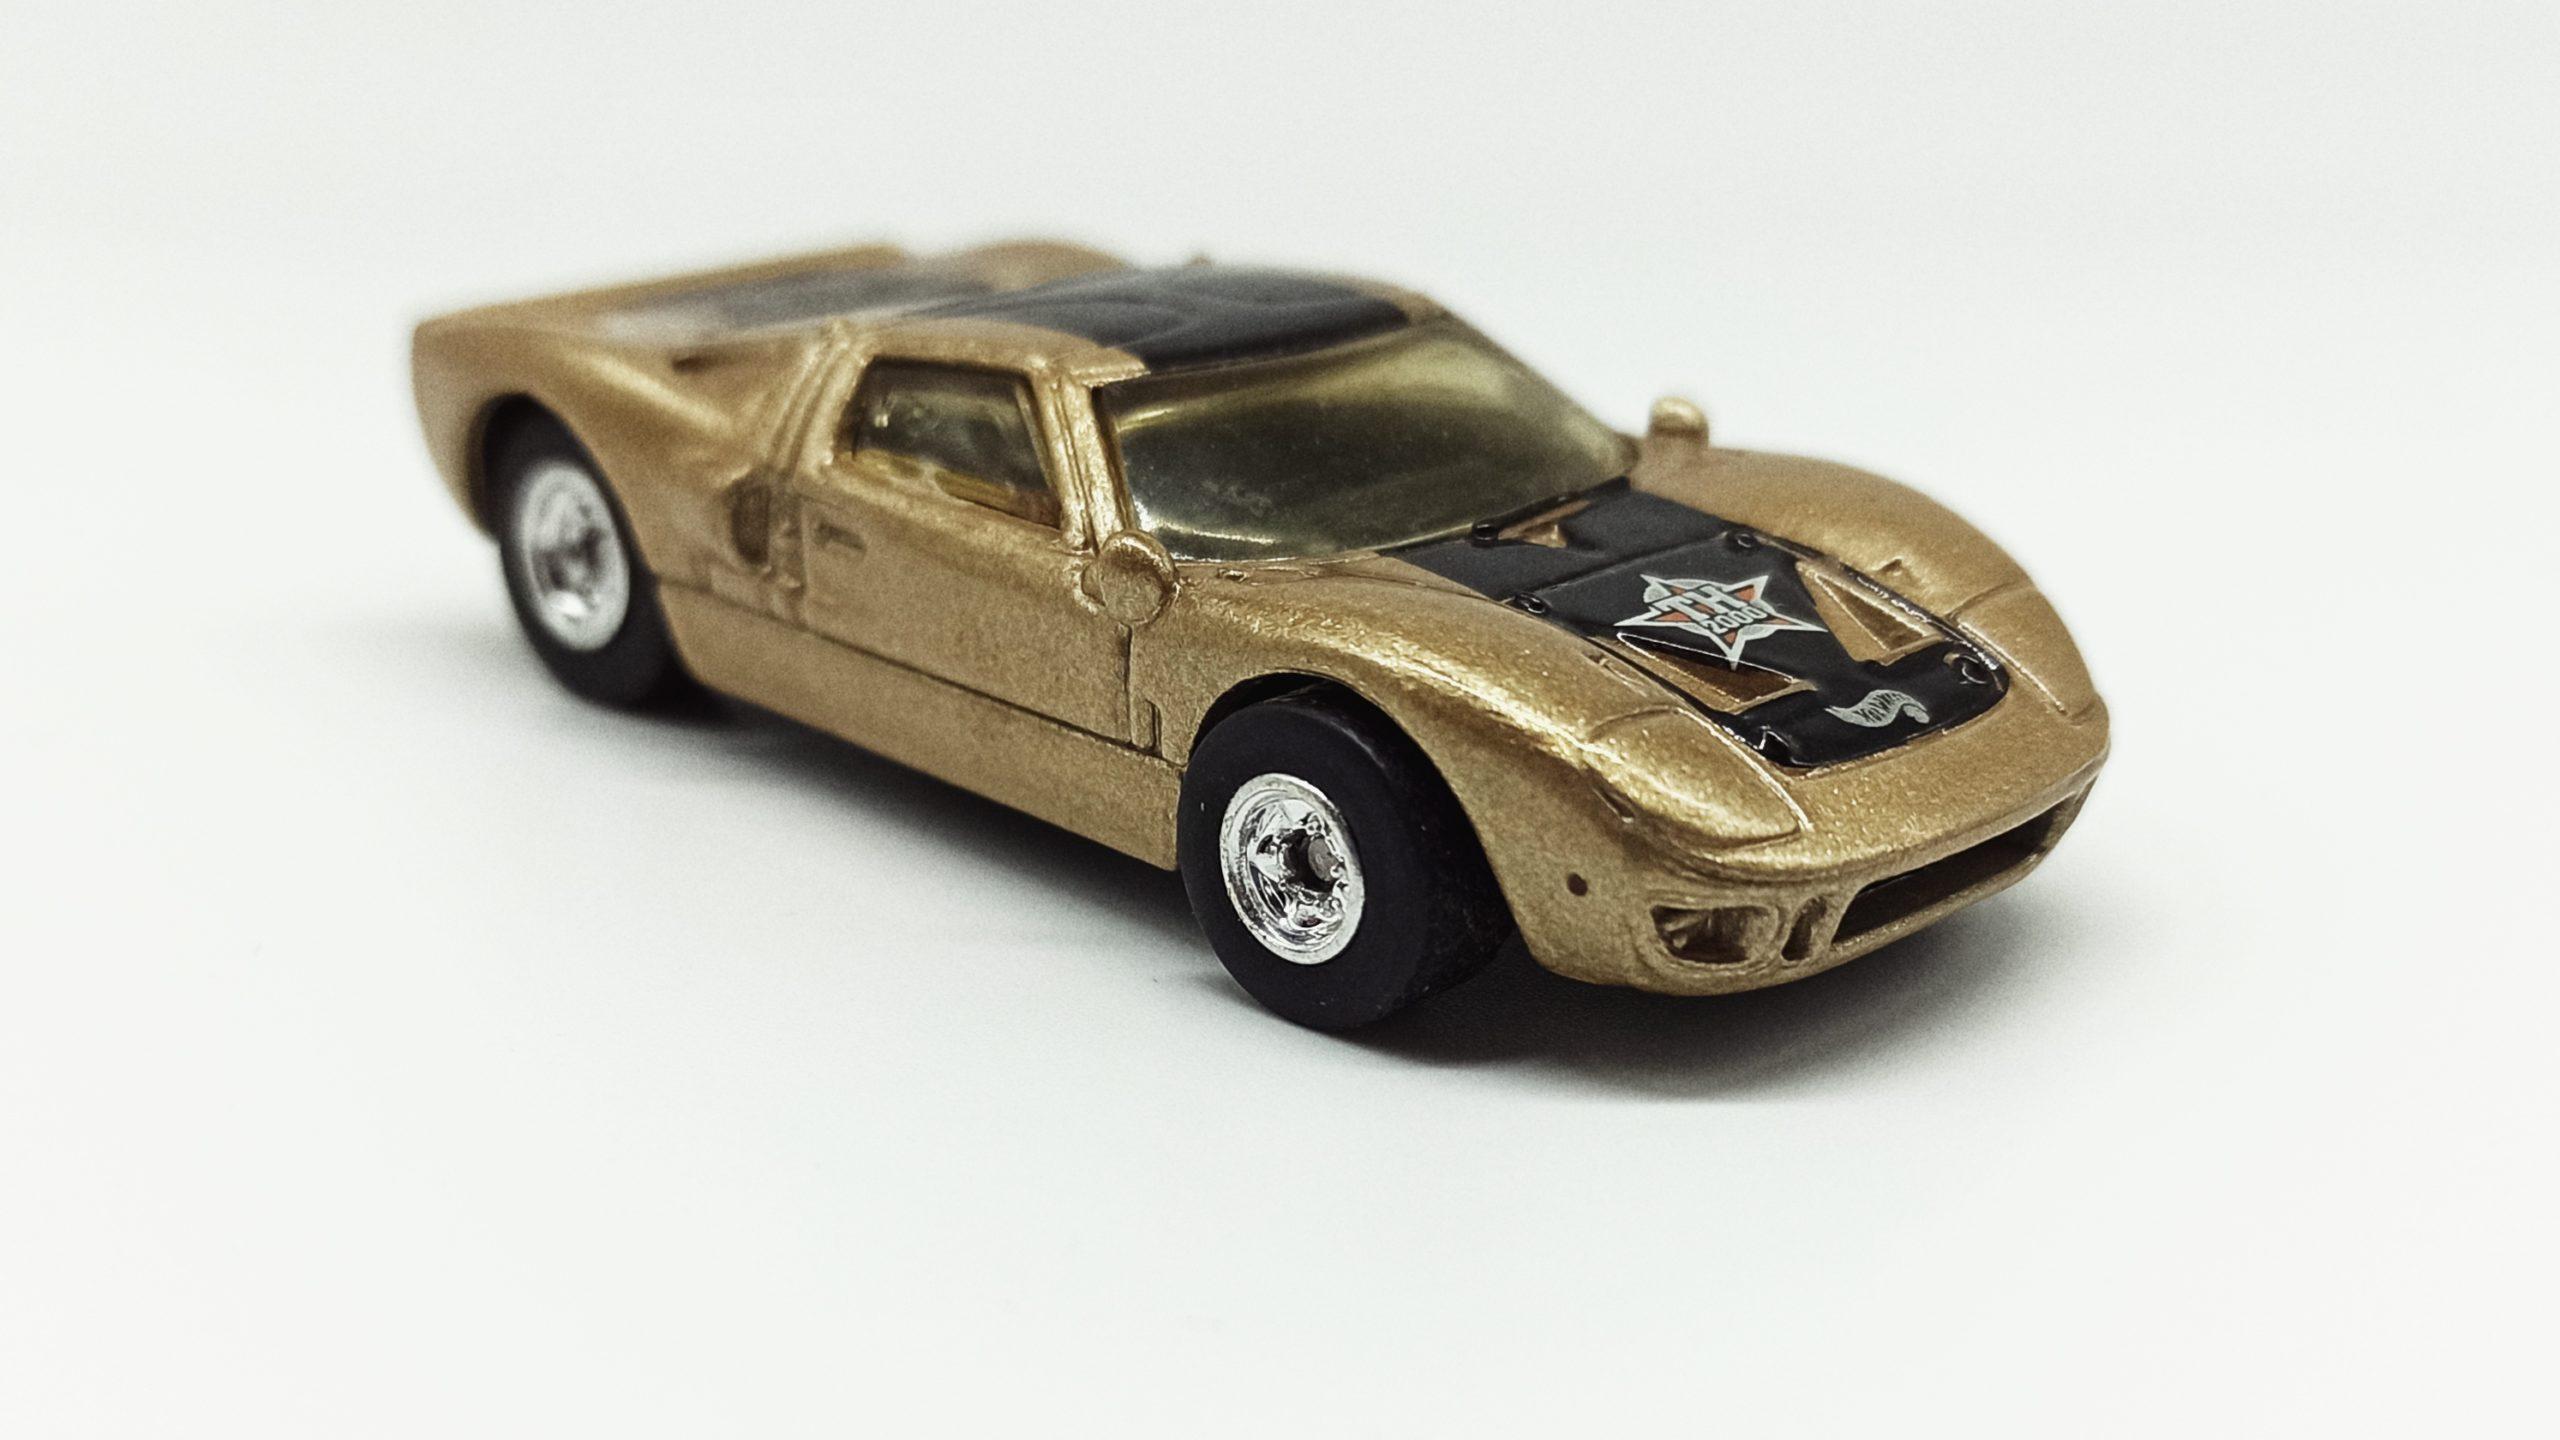 Hot Wheels Ford GT-40 (26381) 2000 59 Treasure Hunts (11/12) metalflake gold side angle